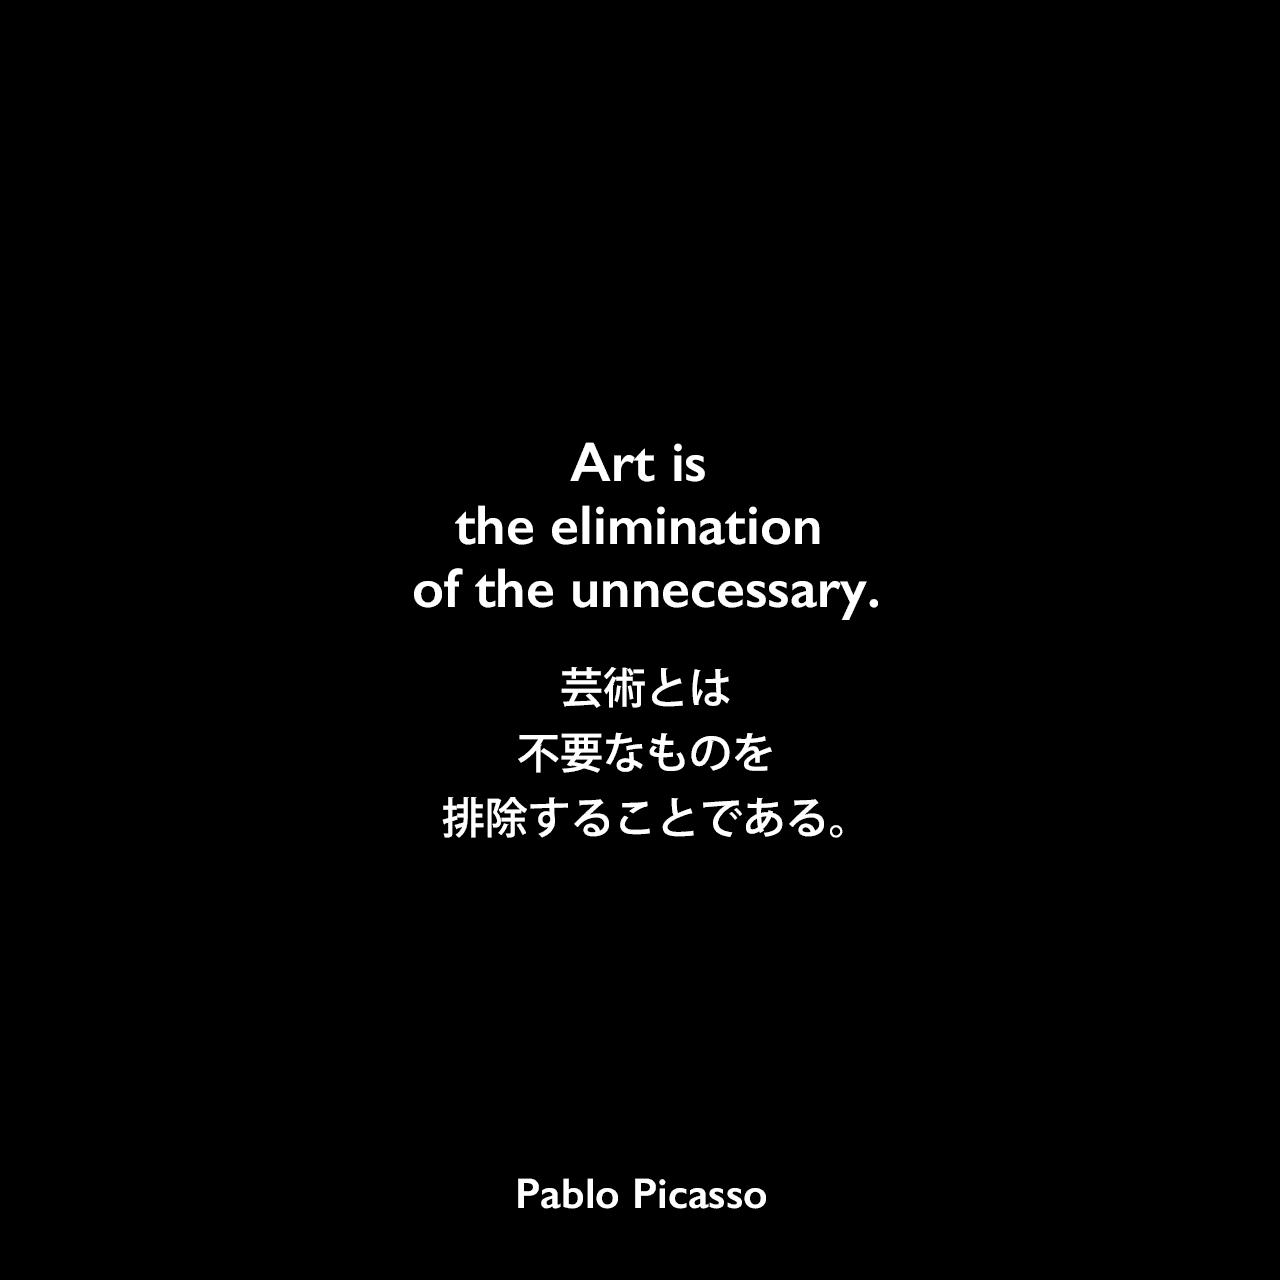 Art is the elimination of the unnecessary.芸術とは不要なものを排除することである。Pablo Picasso